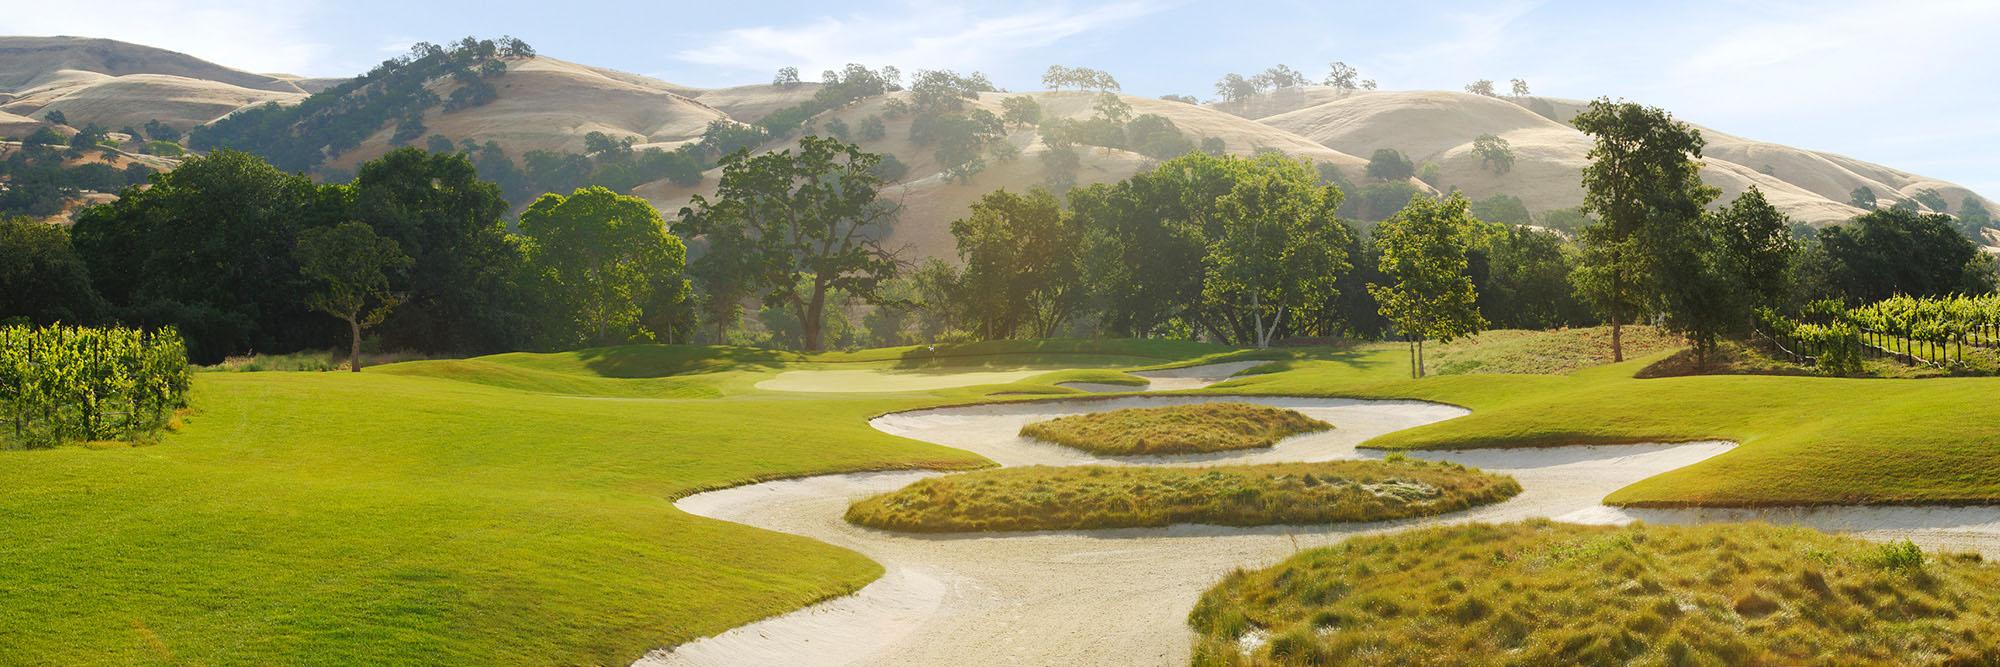 Golf Course Image - Yocha Dehe No. 13